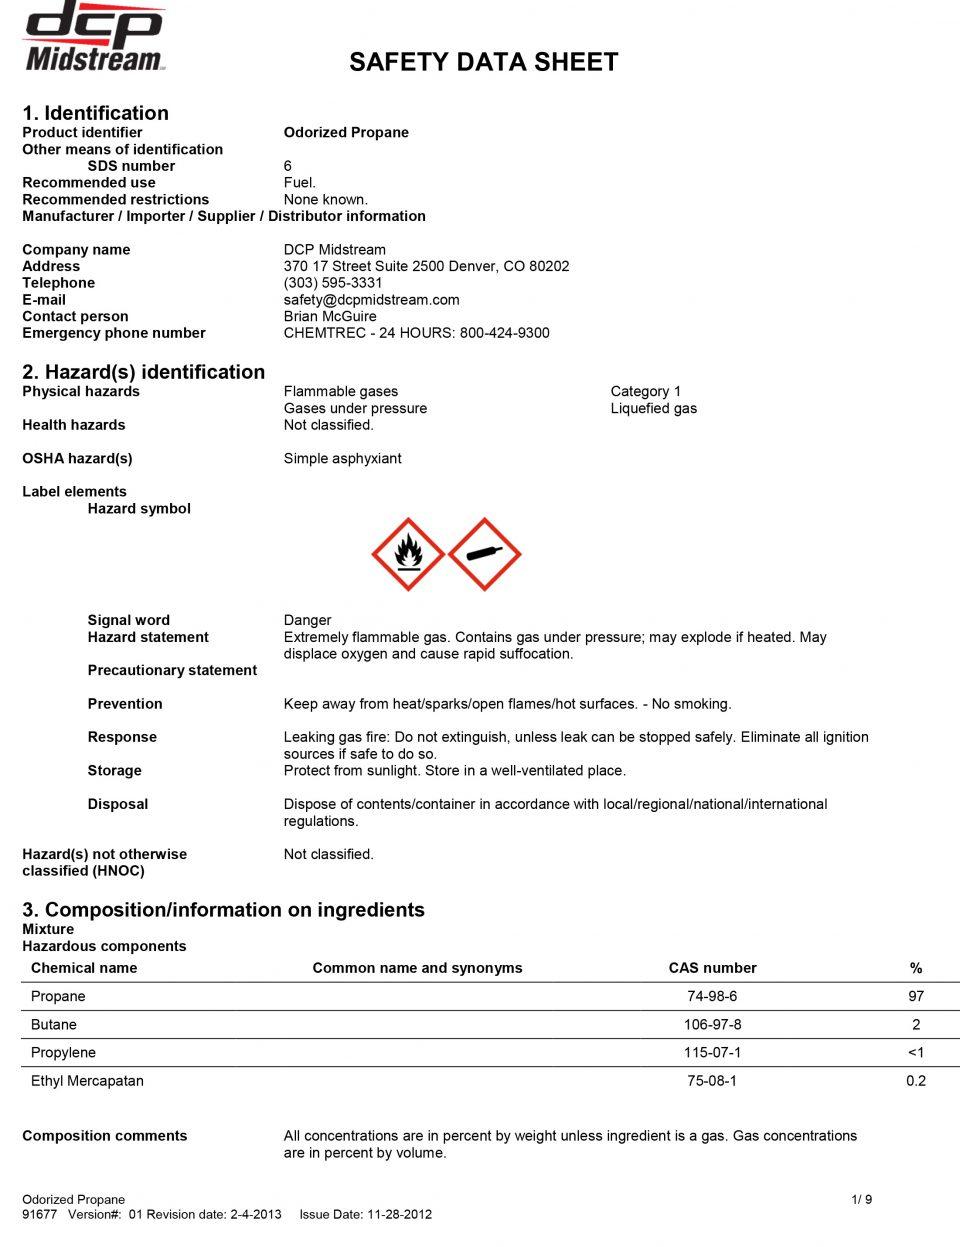 Propane-Odorized-MSDS-2-4-2013-1-e1523635156948